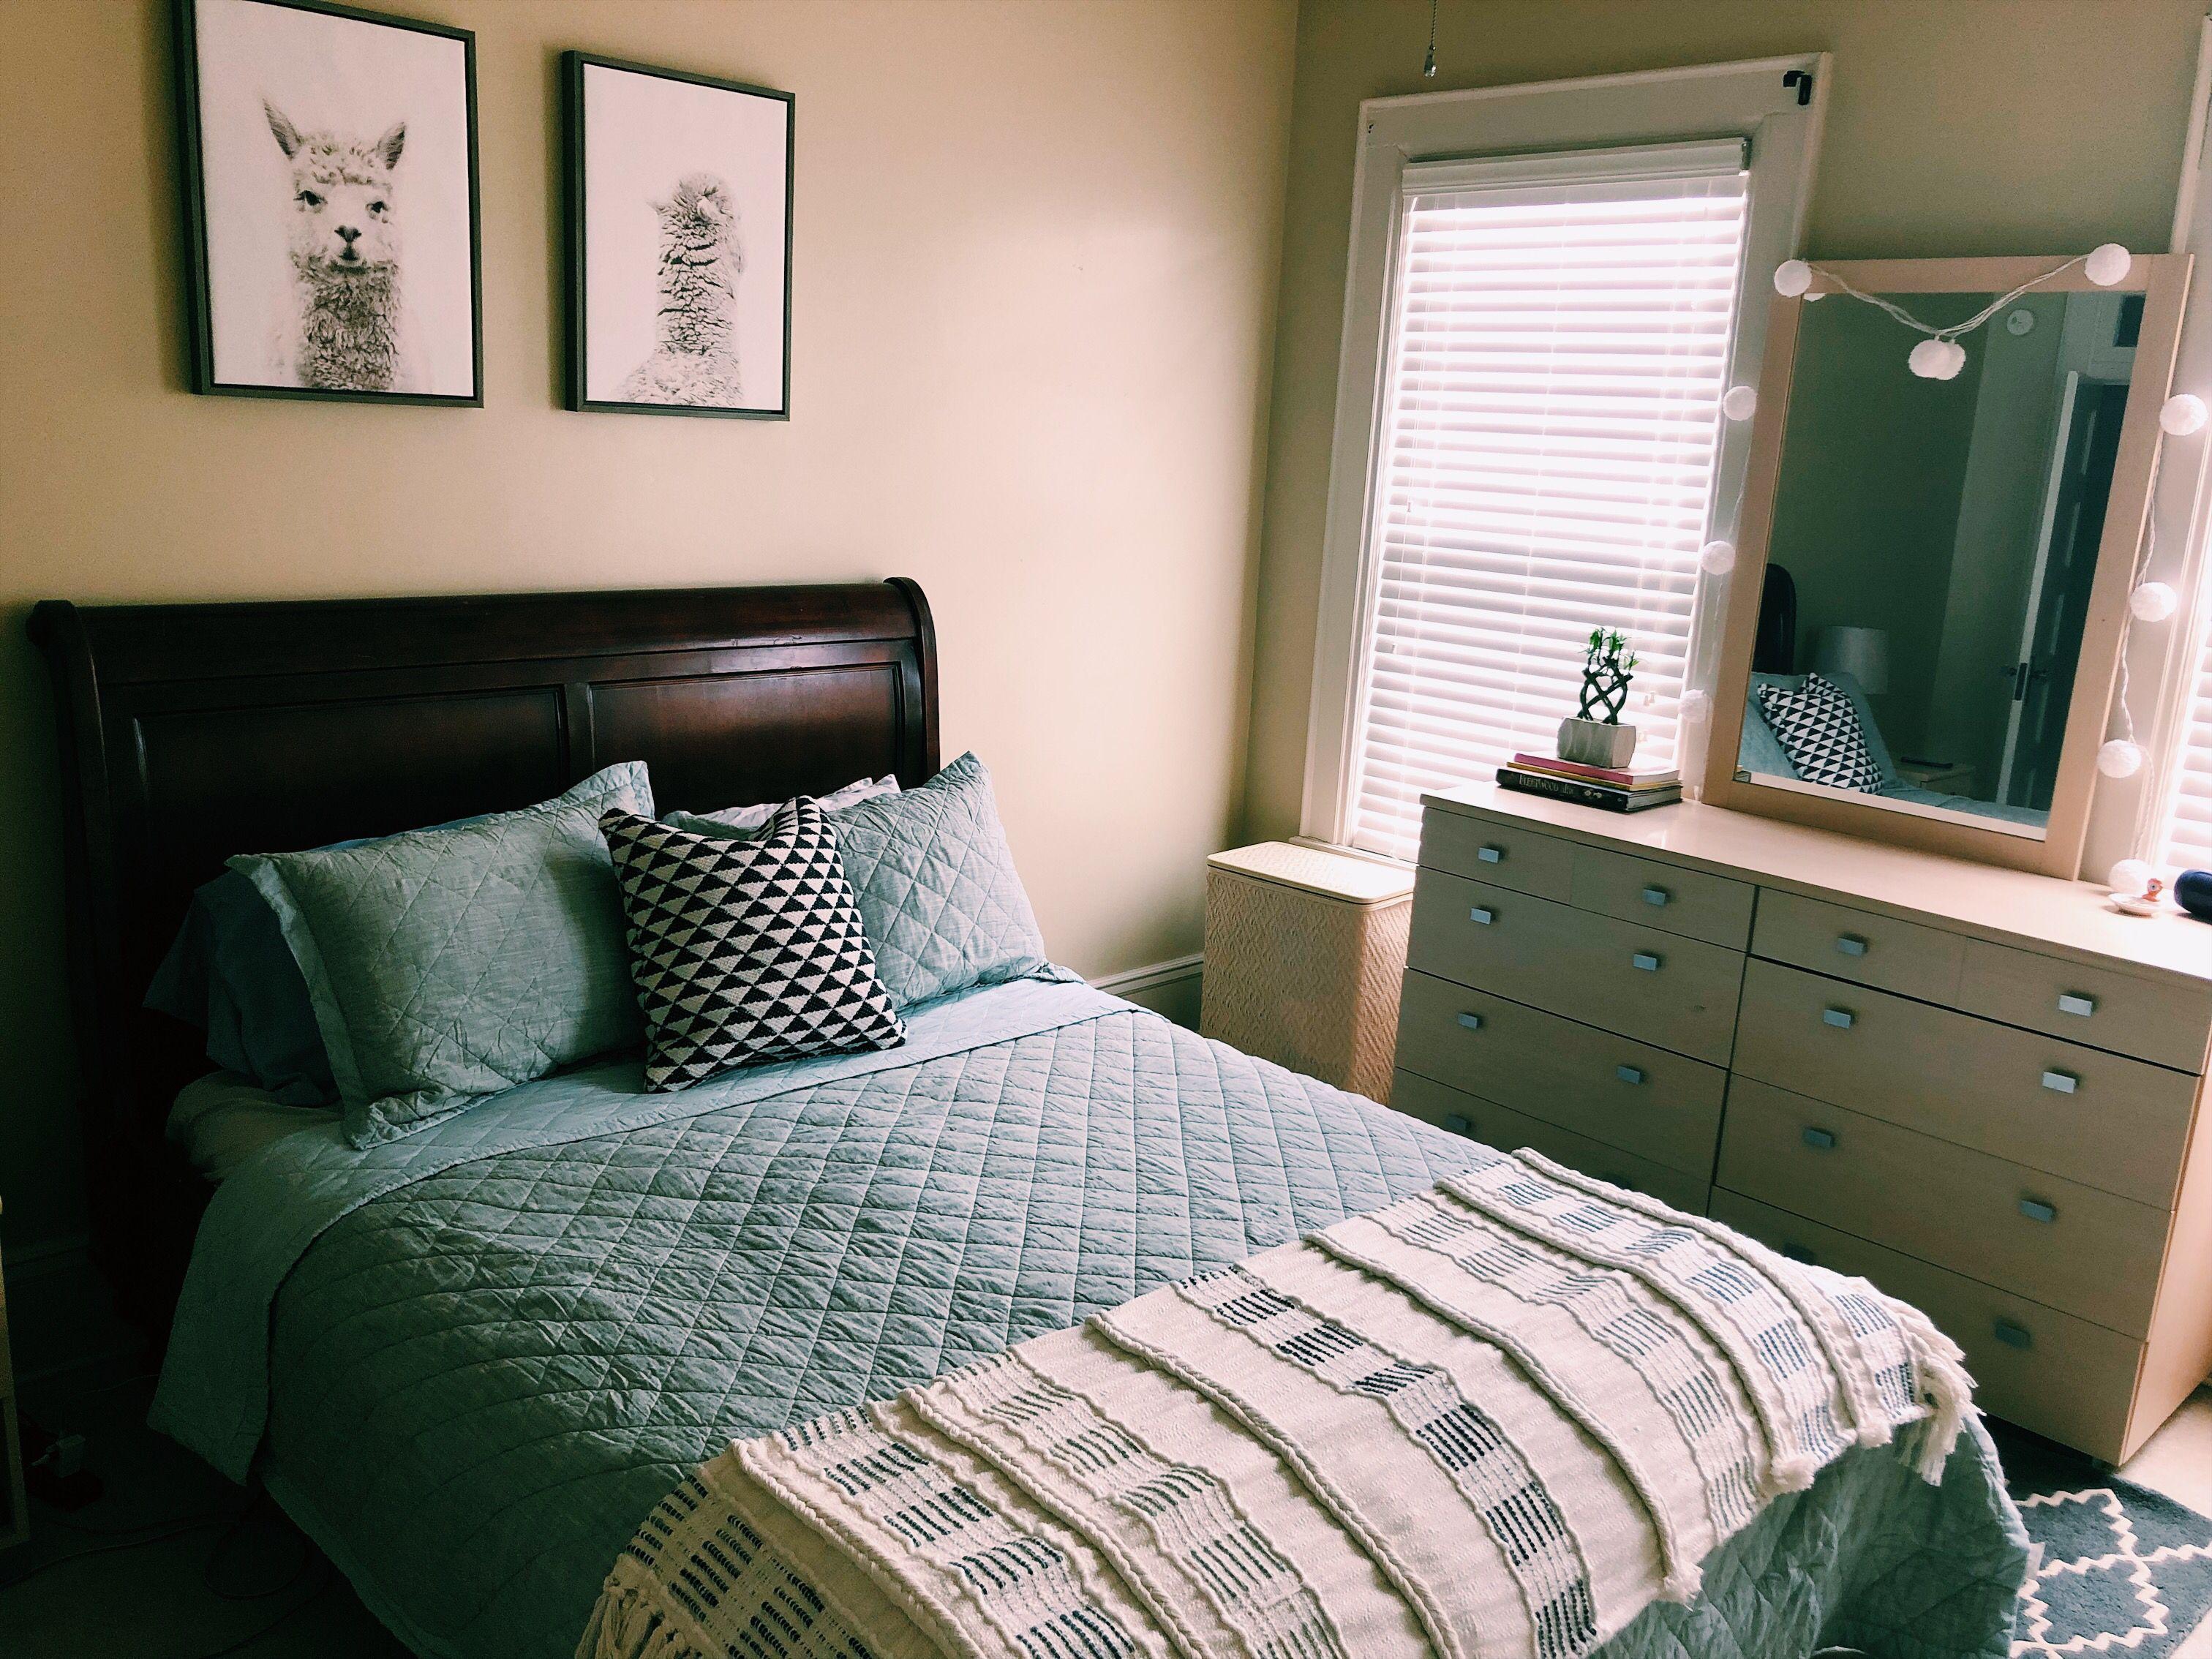 Scandinavian, Marshall's, Home Goods | Cozy apartment ...